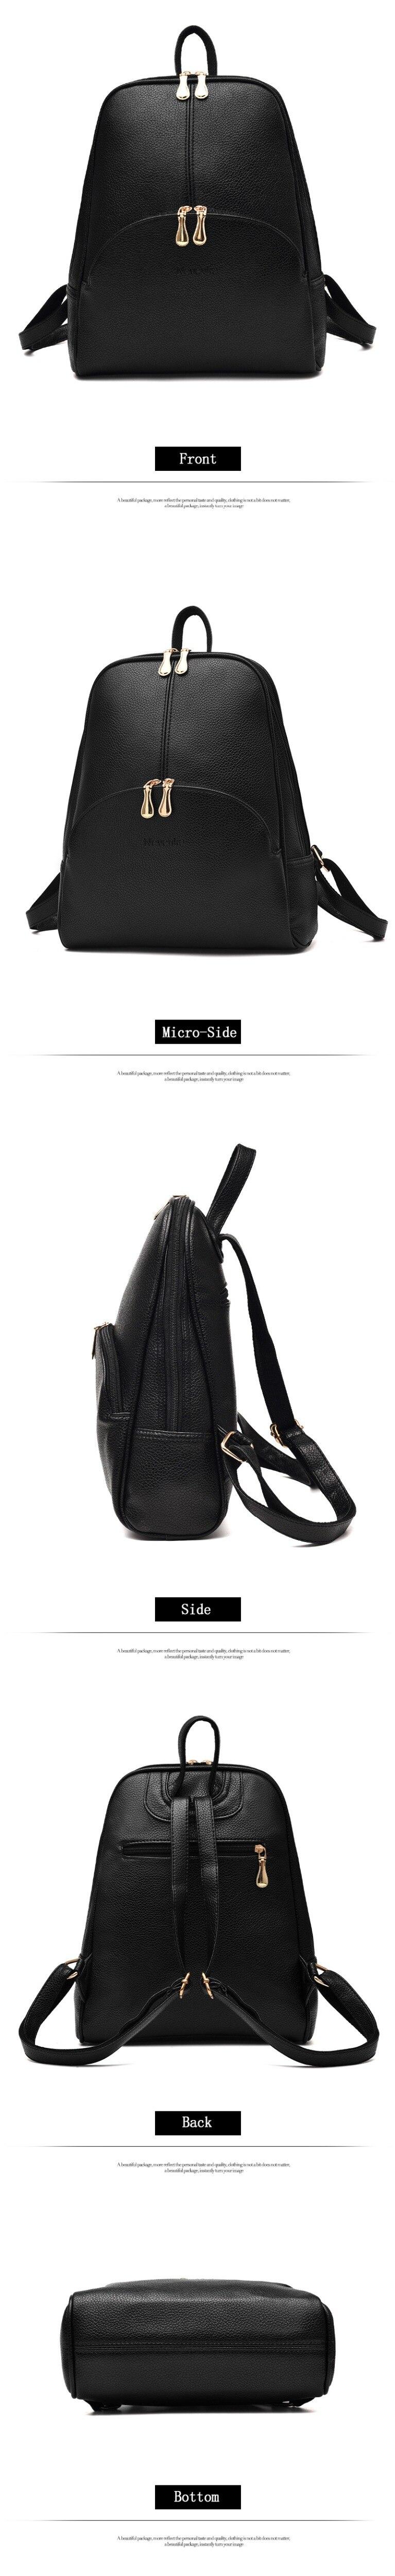 HTB1yKXIaZvrK1Rjy0Feq6ATmVXaz Nevenka Mini Backpack Women Light Weight Daypacks Girls Fashion Backpacks Ladies Leather School Bag Female Gray Backpack Black